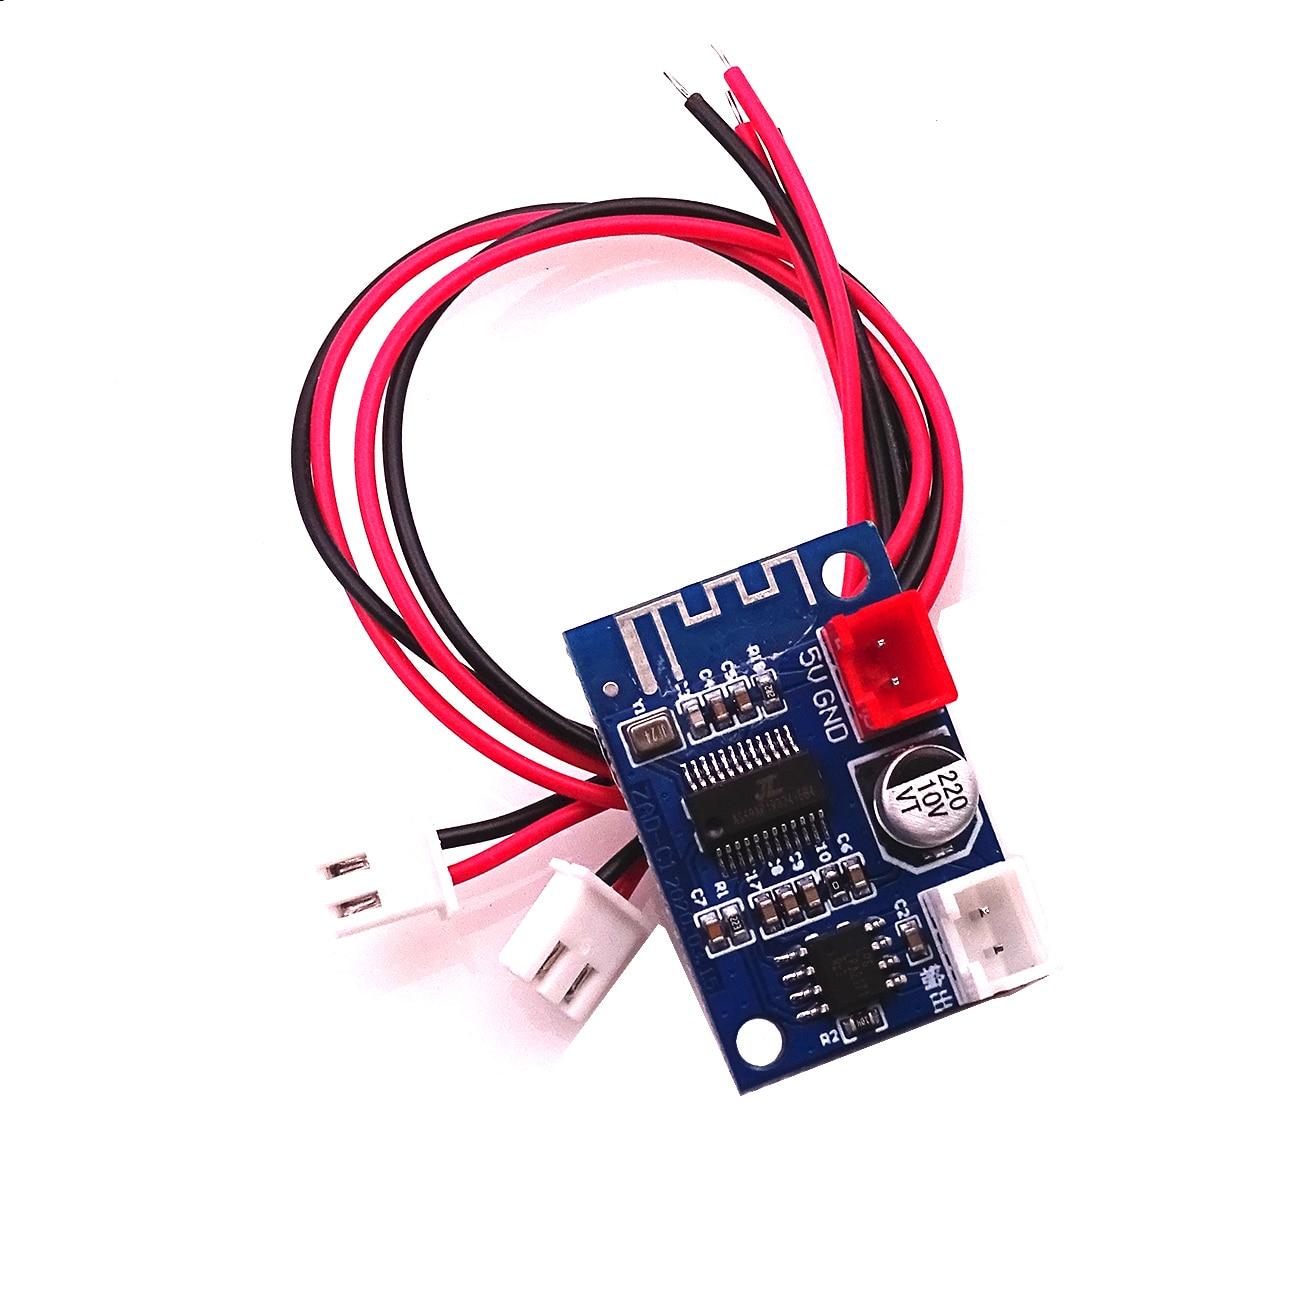 5V Bluetooth מגבר מודול 5W מונו Class D אלחוטי Lossless מוסיקה נגן דיגיטלי כוח מגבר סיים לוח